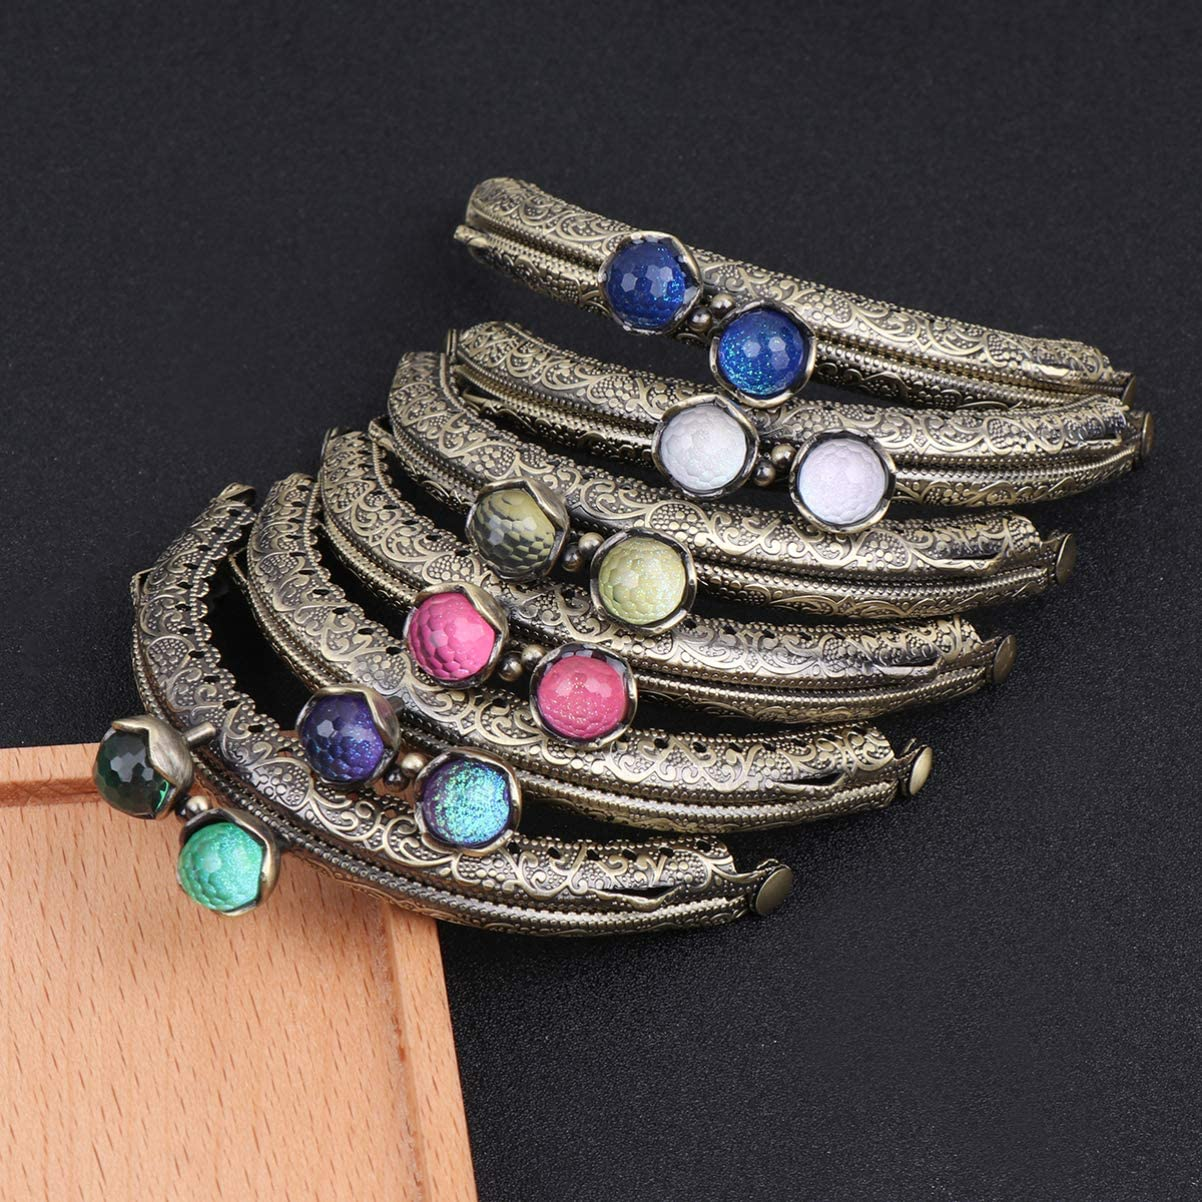 Healifty Metal Purse Frame Coin Bag Kiss Clasp Lock Semicircle Handbag Handle for Bag Making DIY Craft 8.5cm 6pcs